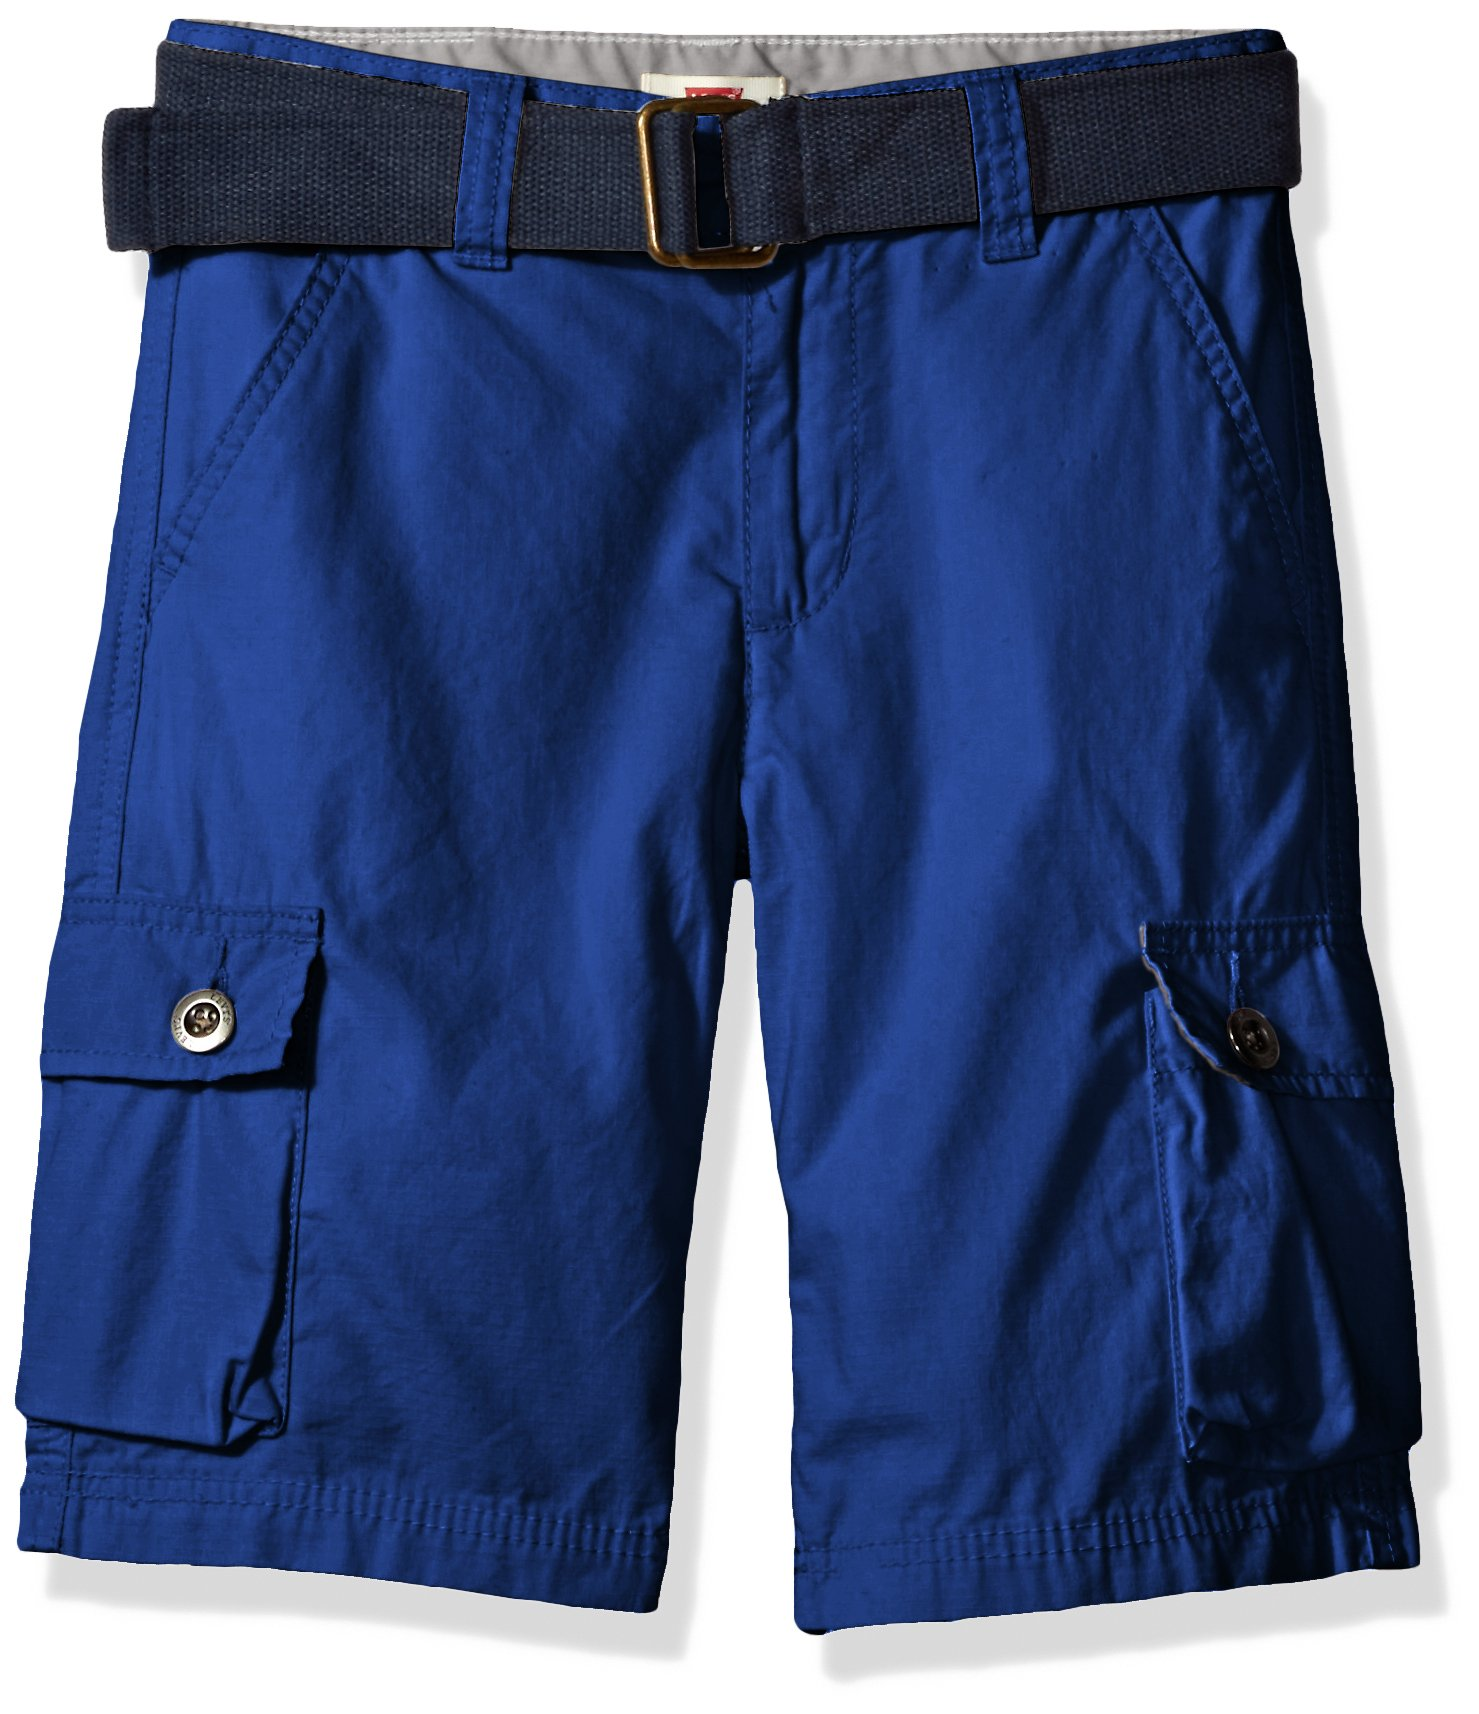 Levi's Boys' Big Cargo Shorts, Sodalite Blue, 12 by Levi's